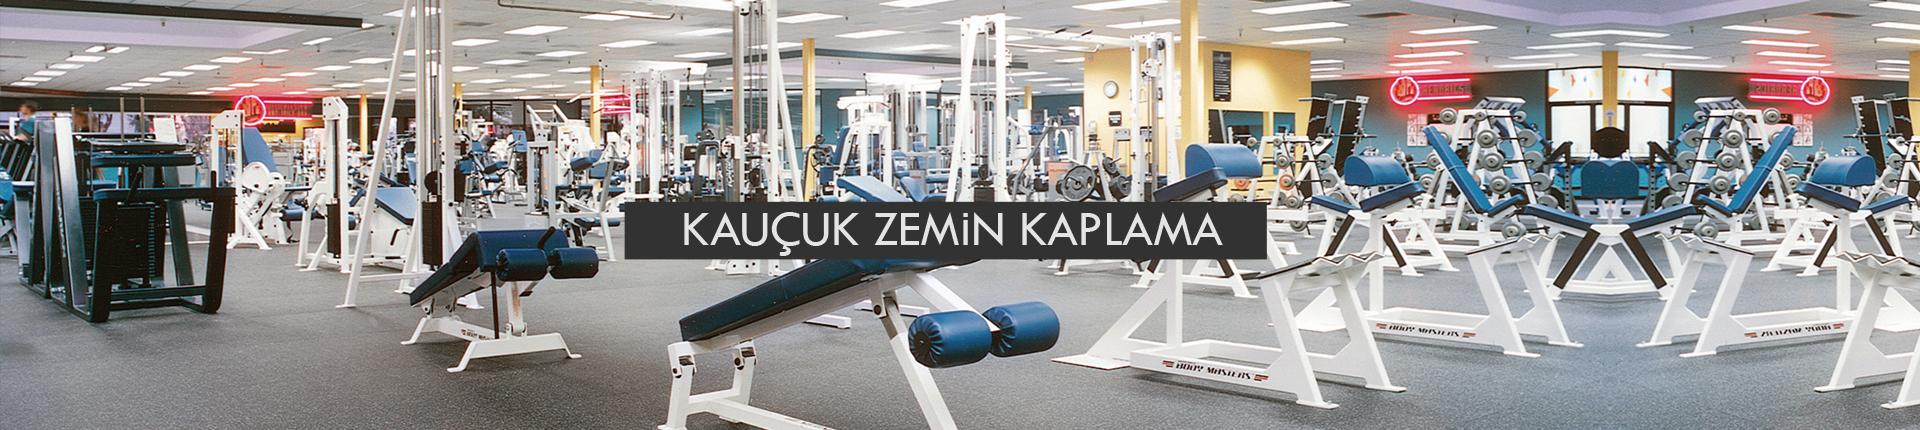 kaucuk-zemin-arka2